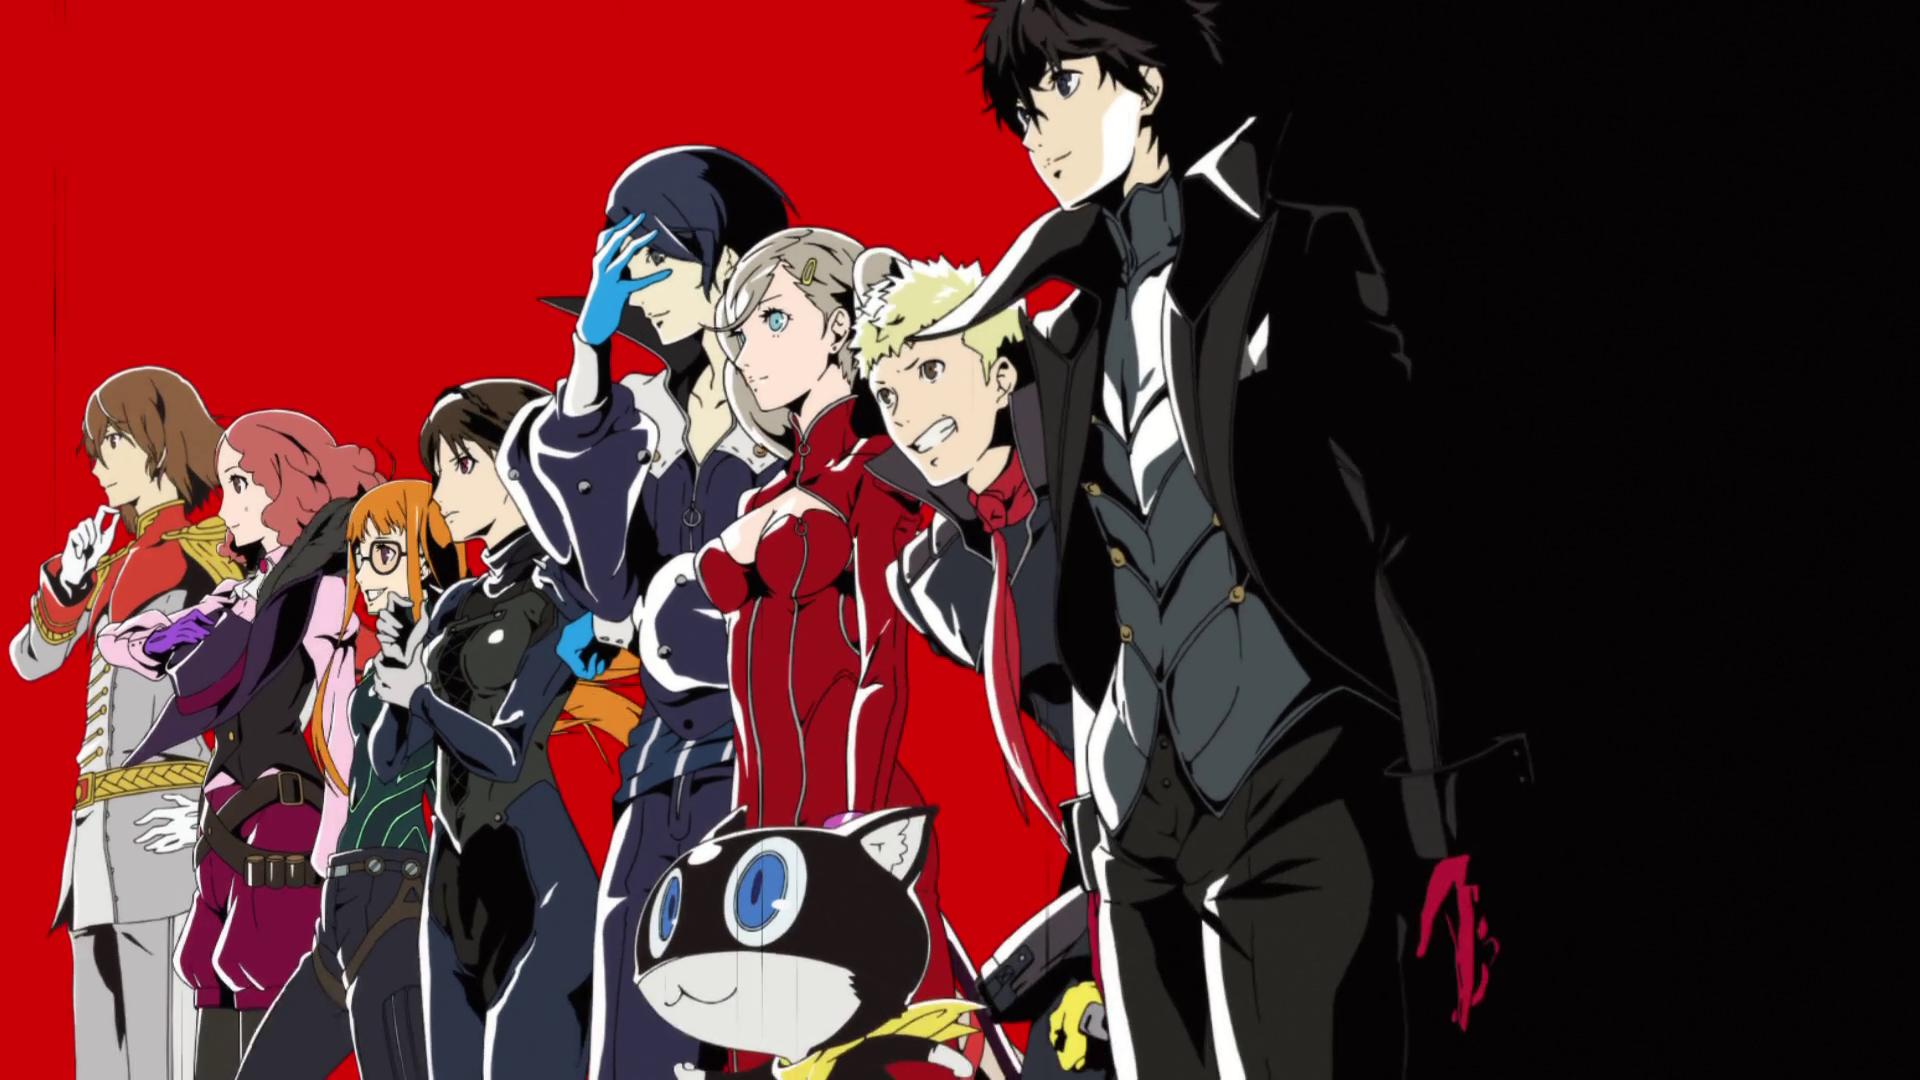 Persona 5 Royal Phantom Launch Edition